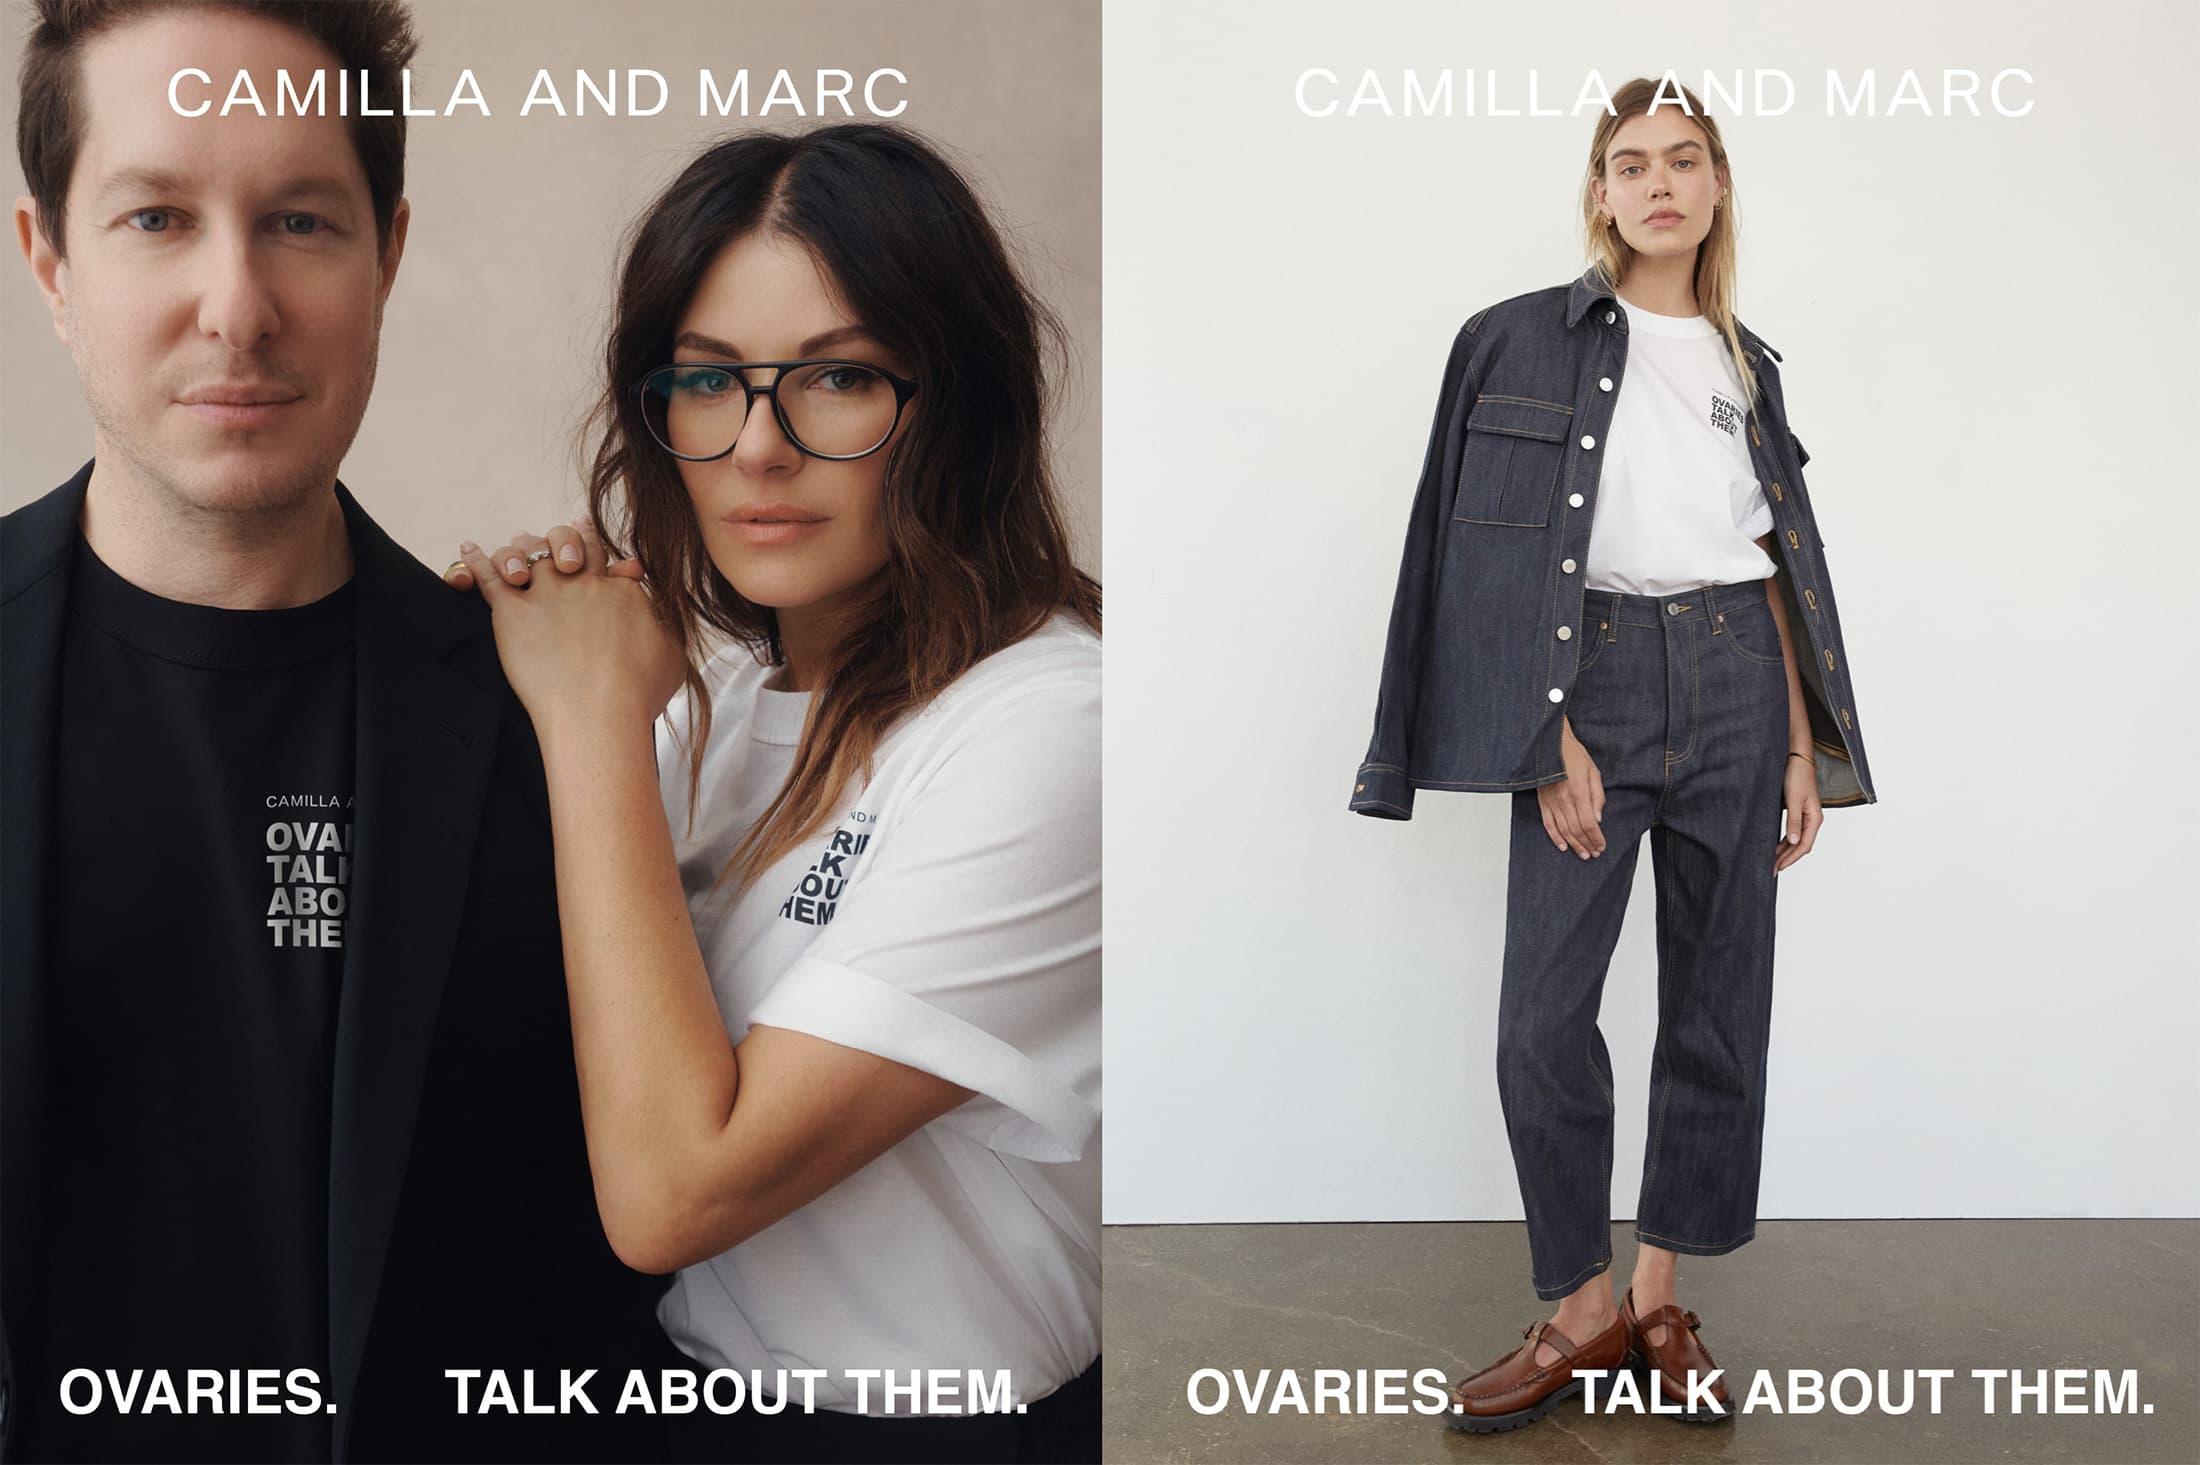 Camilla and Marc Ovarian Cancer 2021 Campaign Photos